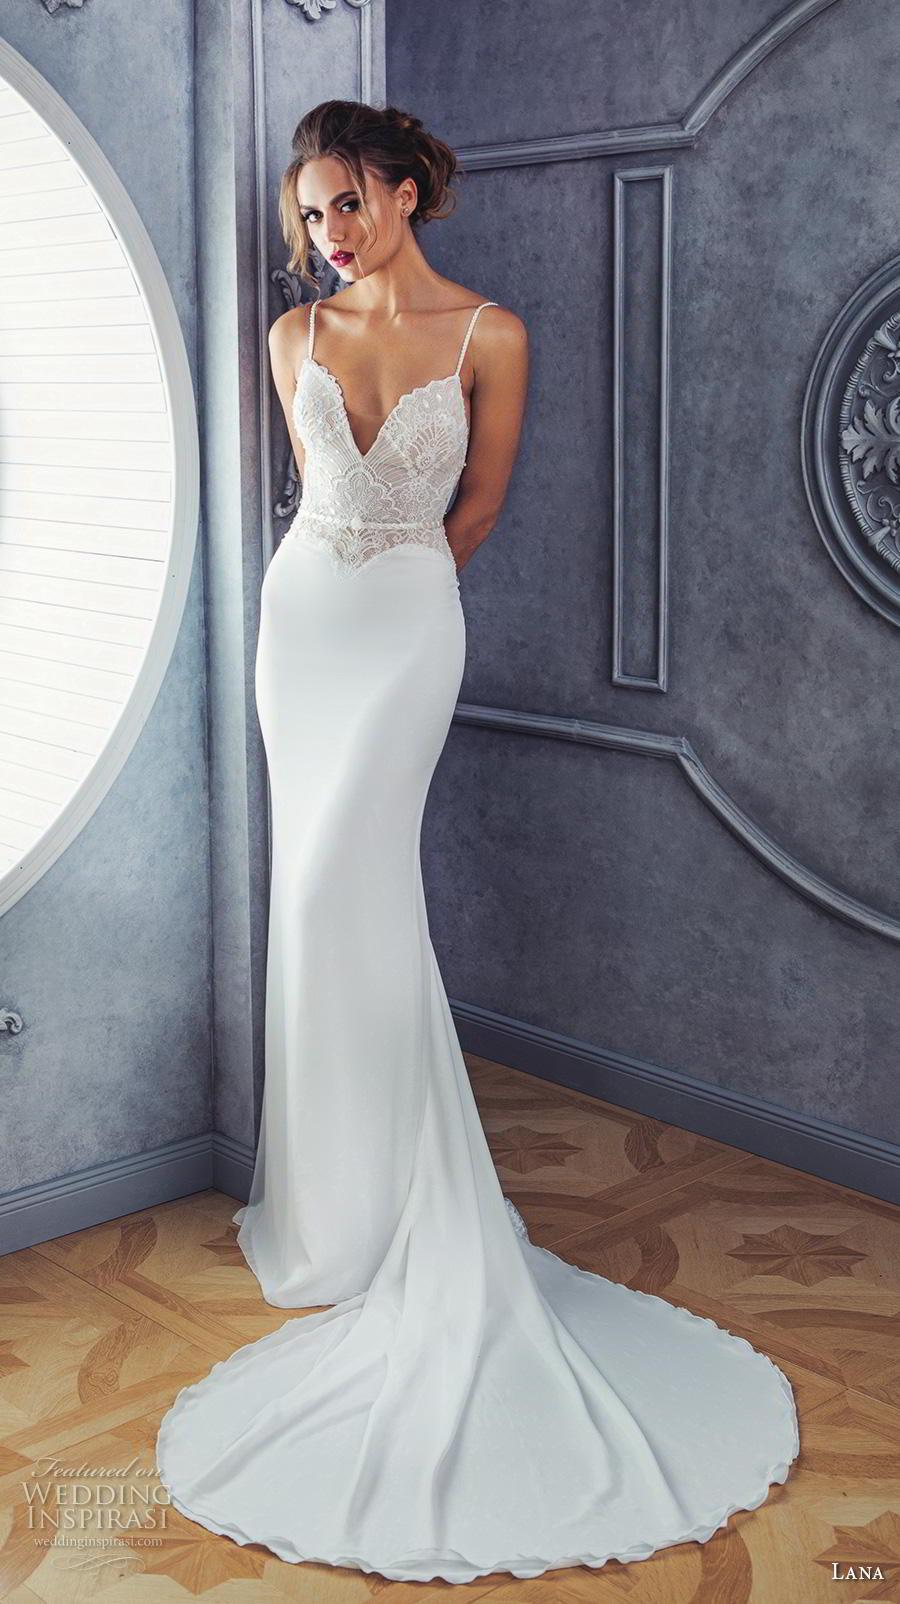 lana 2018 bridal spaghetti strap deep sweetheart neckline heavily embellished bodice satin skirt elegant sheath fit and flare wedding dress medium train (4) mv